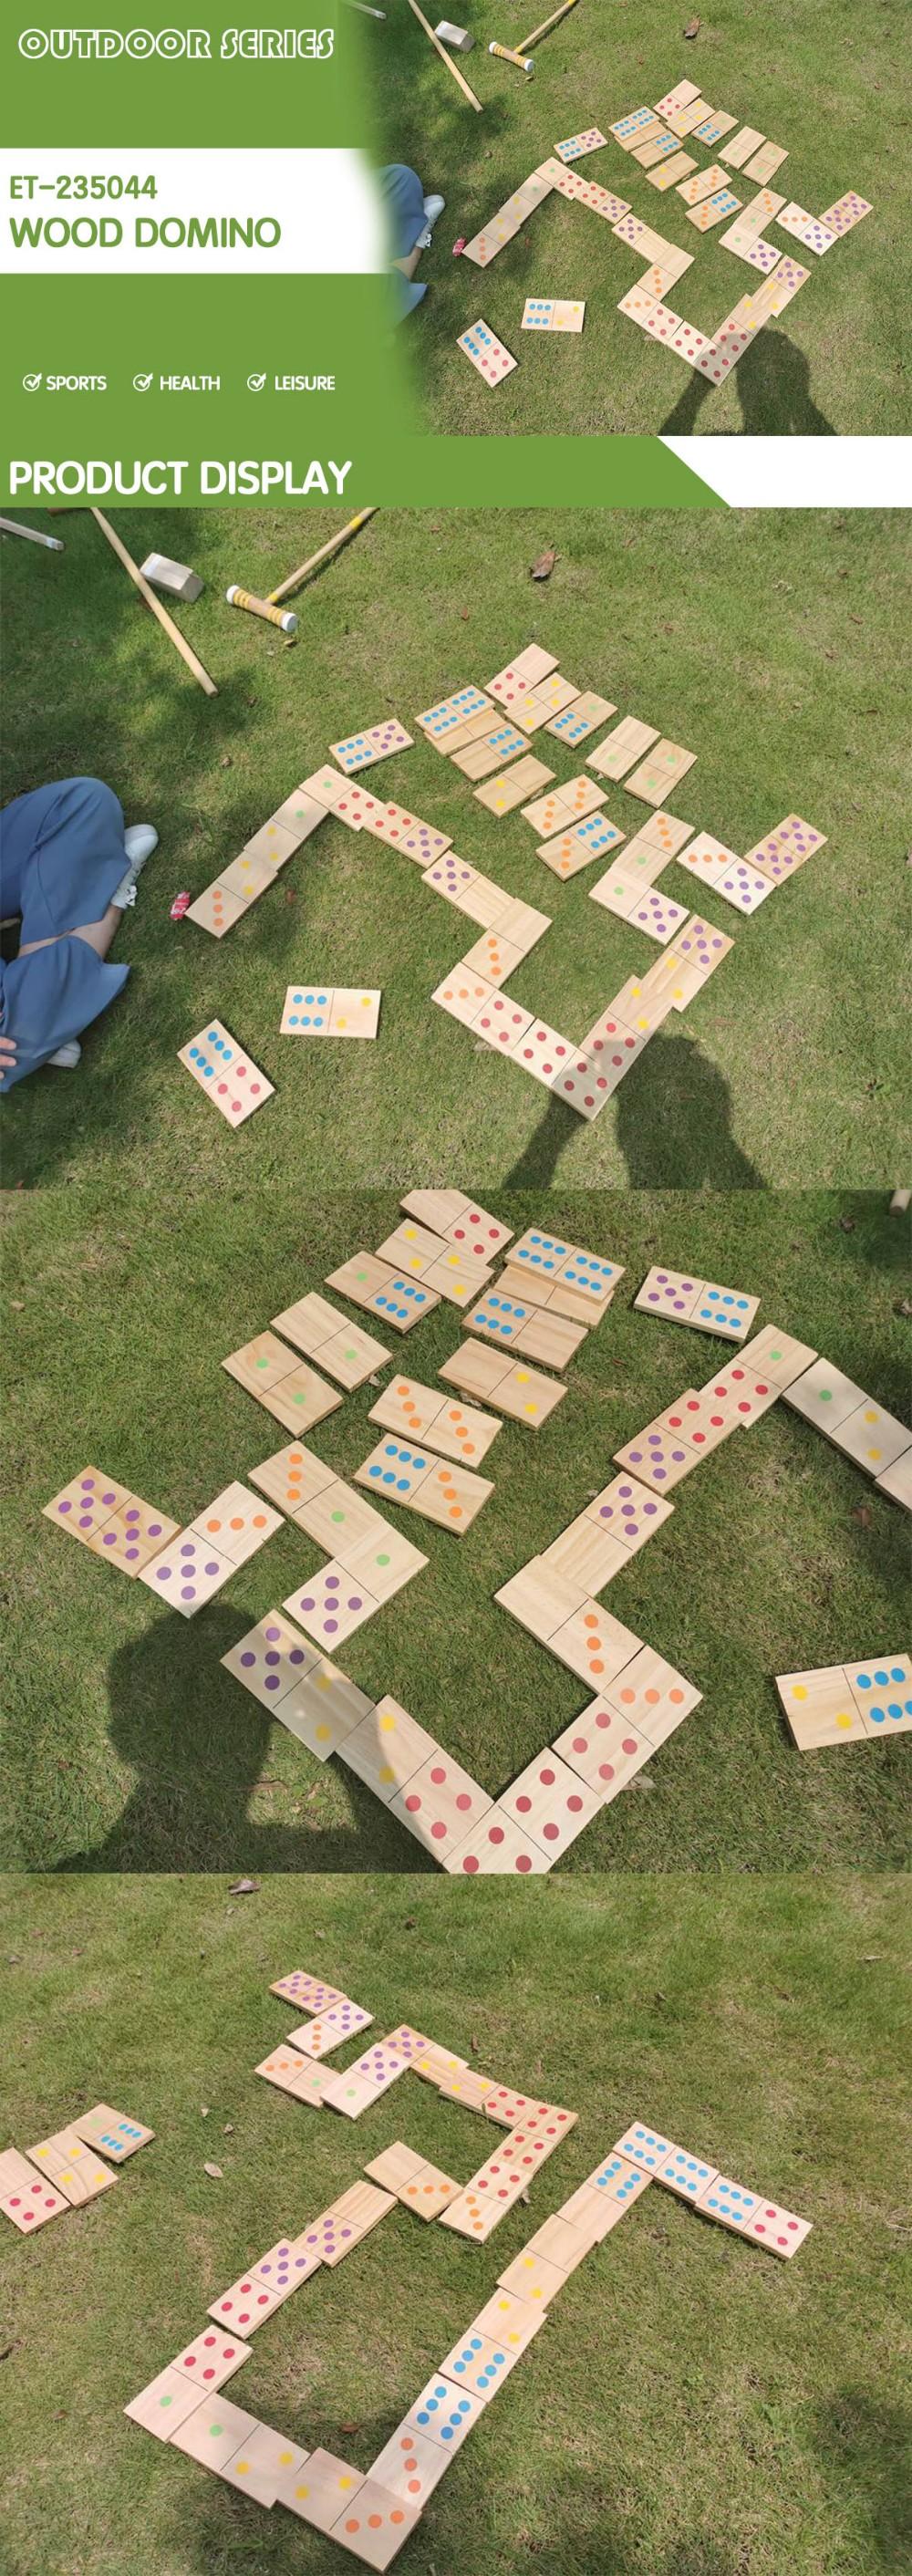 domino game toy set